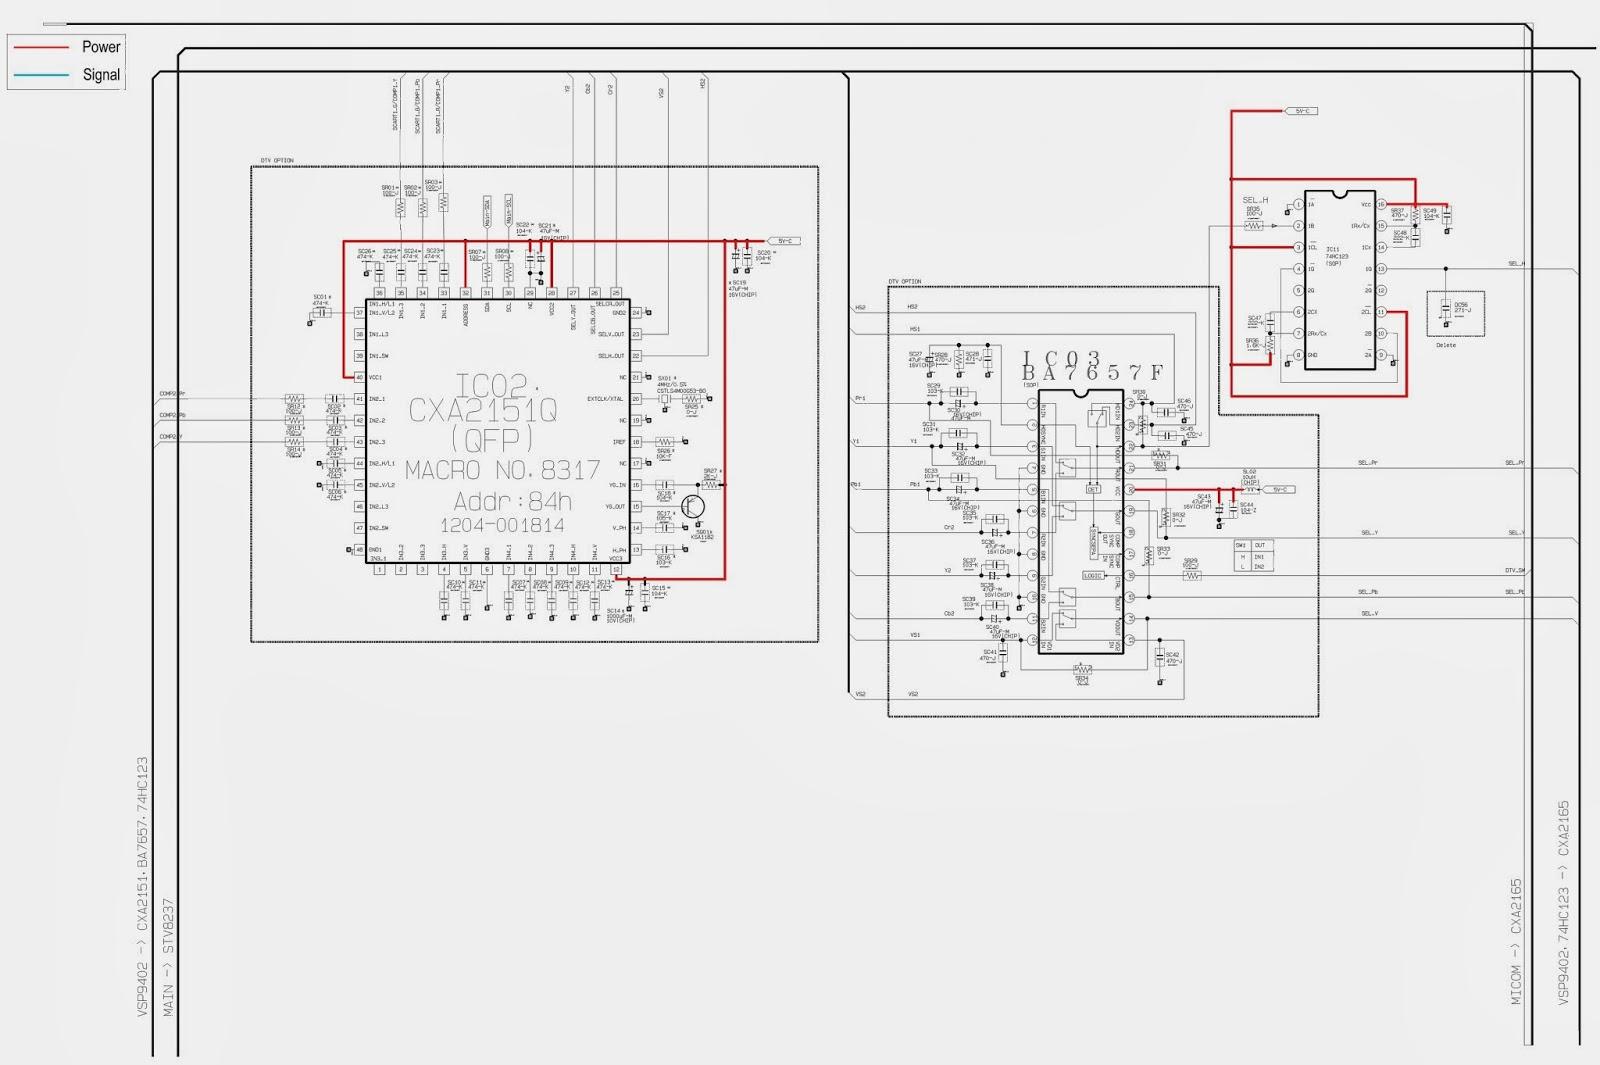 97 Nissan 240sx Fuse Box. Nissan. Auto Fuse Box Diagram